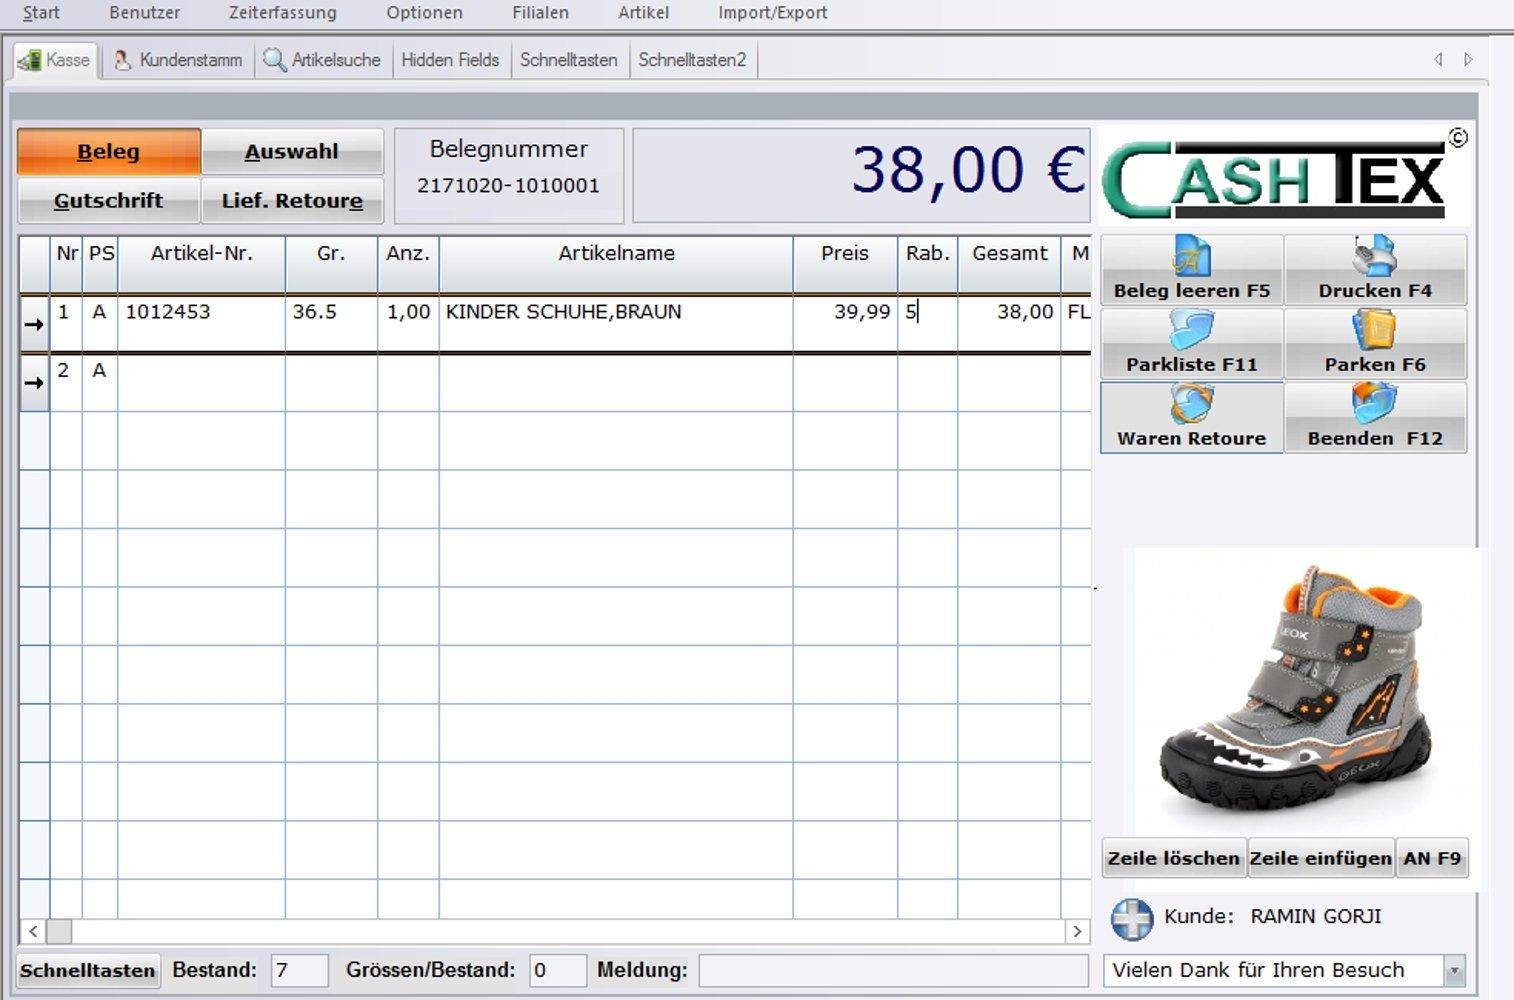 reputable site bc7c0 10884 CASHTEX Kassensystem für Schuhhandel GoBD/GDPdU konform ...